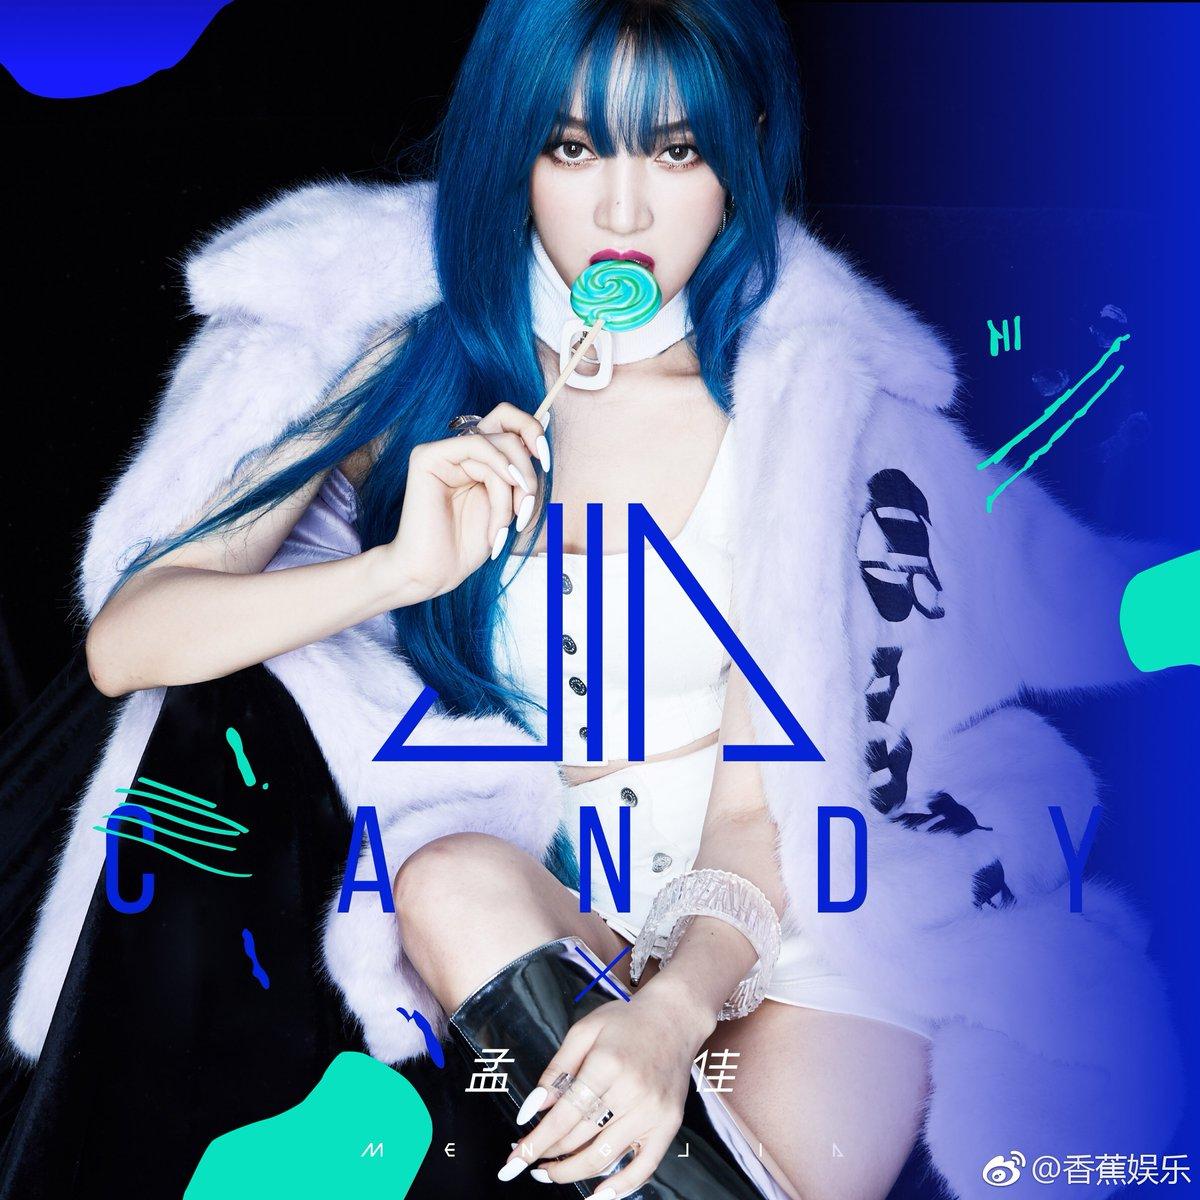 Candy (Meng Jia)